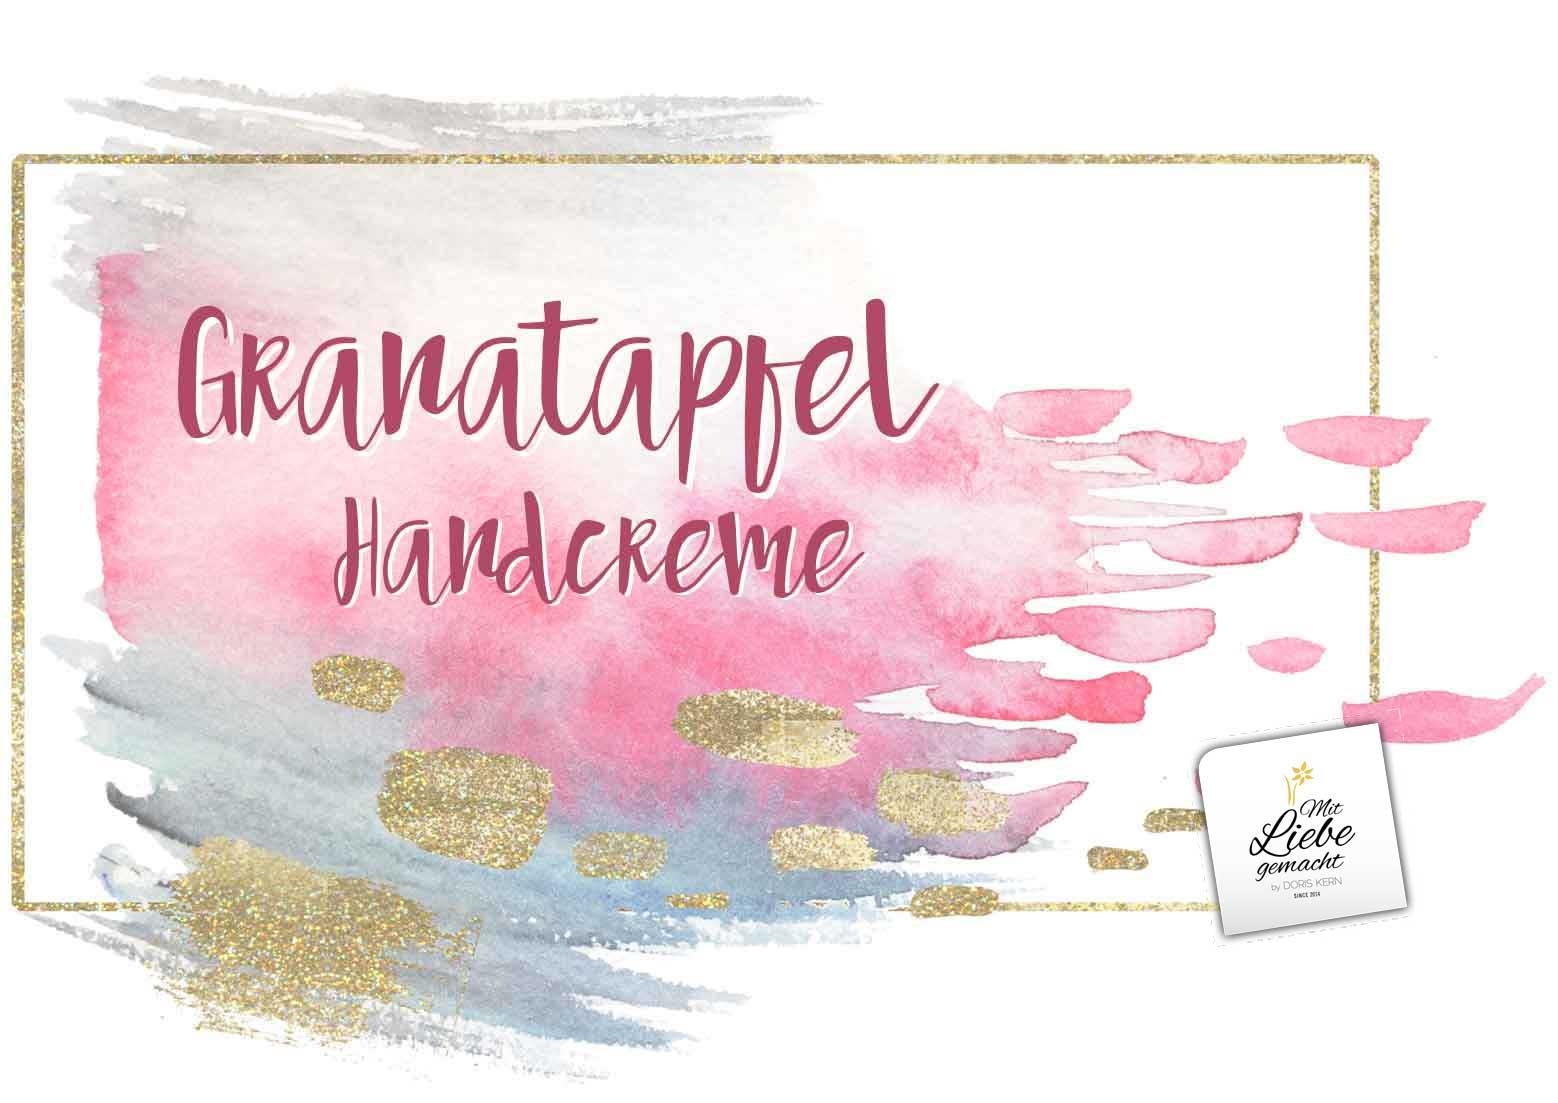 Granatapfel Handcreme